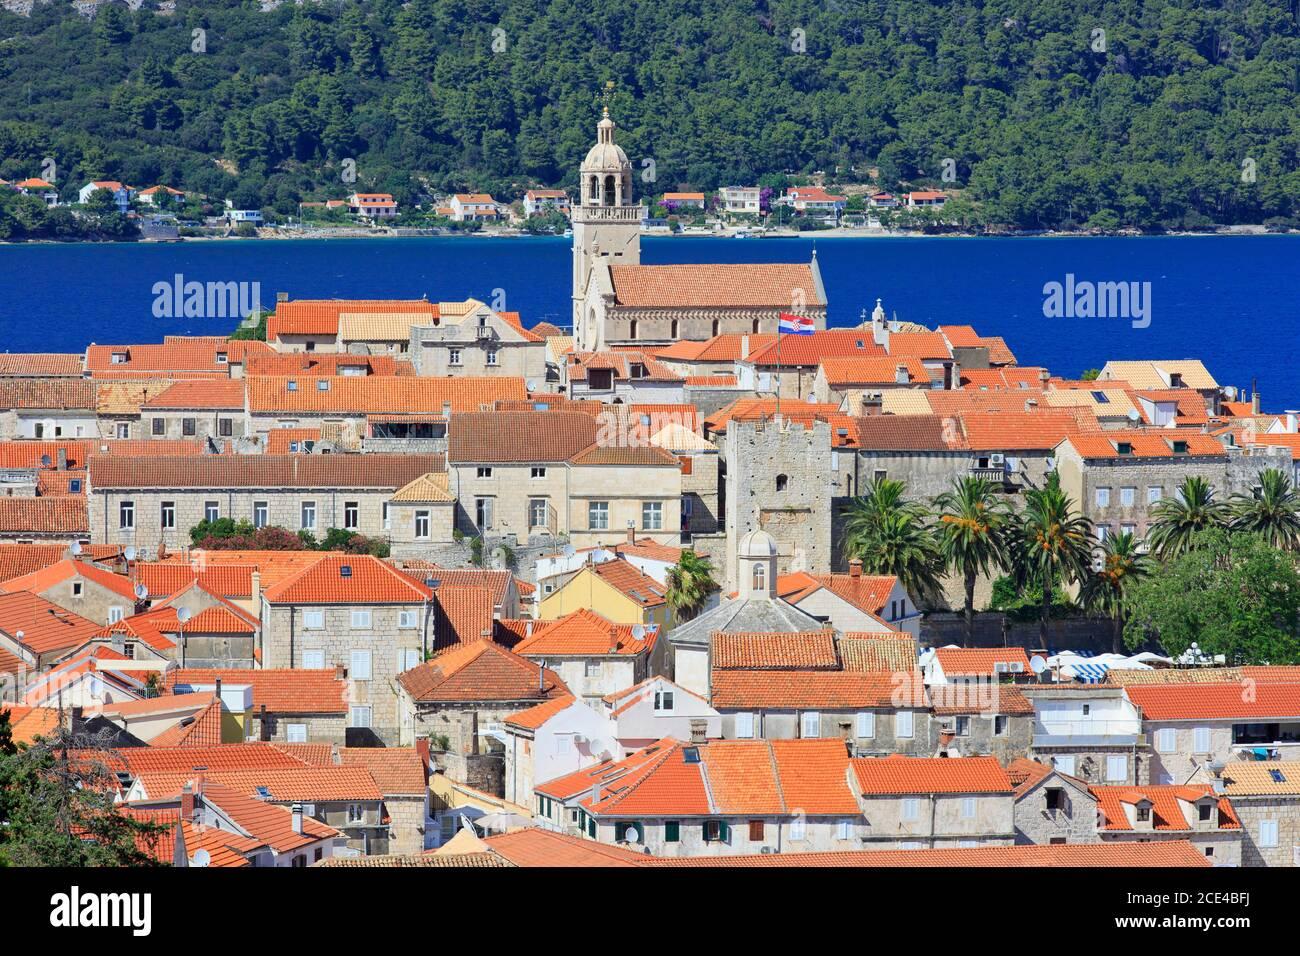 Panoramic view across the picturesque town of Korcula (Dubrovnik-Neretva County), Croatia Stock Photo